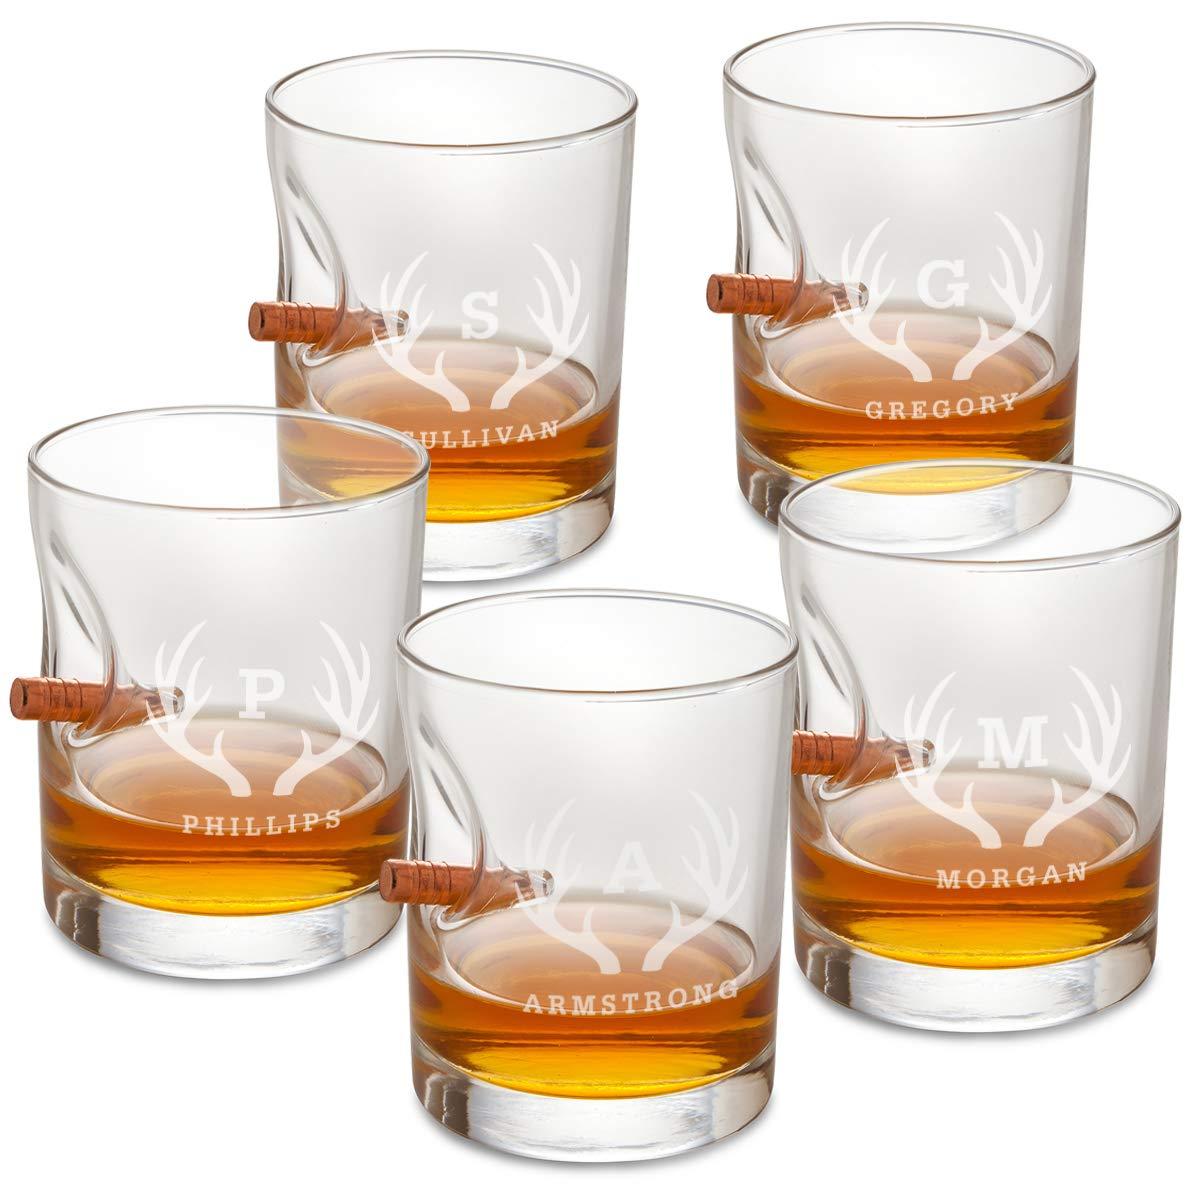 Groomsmen Gifts Set of 5 Whiskey Glasses - Lowball Glass - Bulletproof - (ANTLERS)